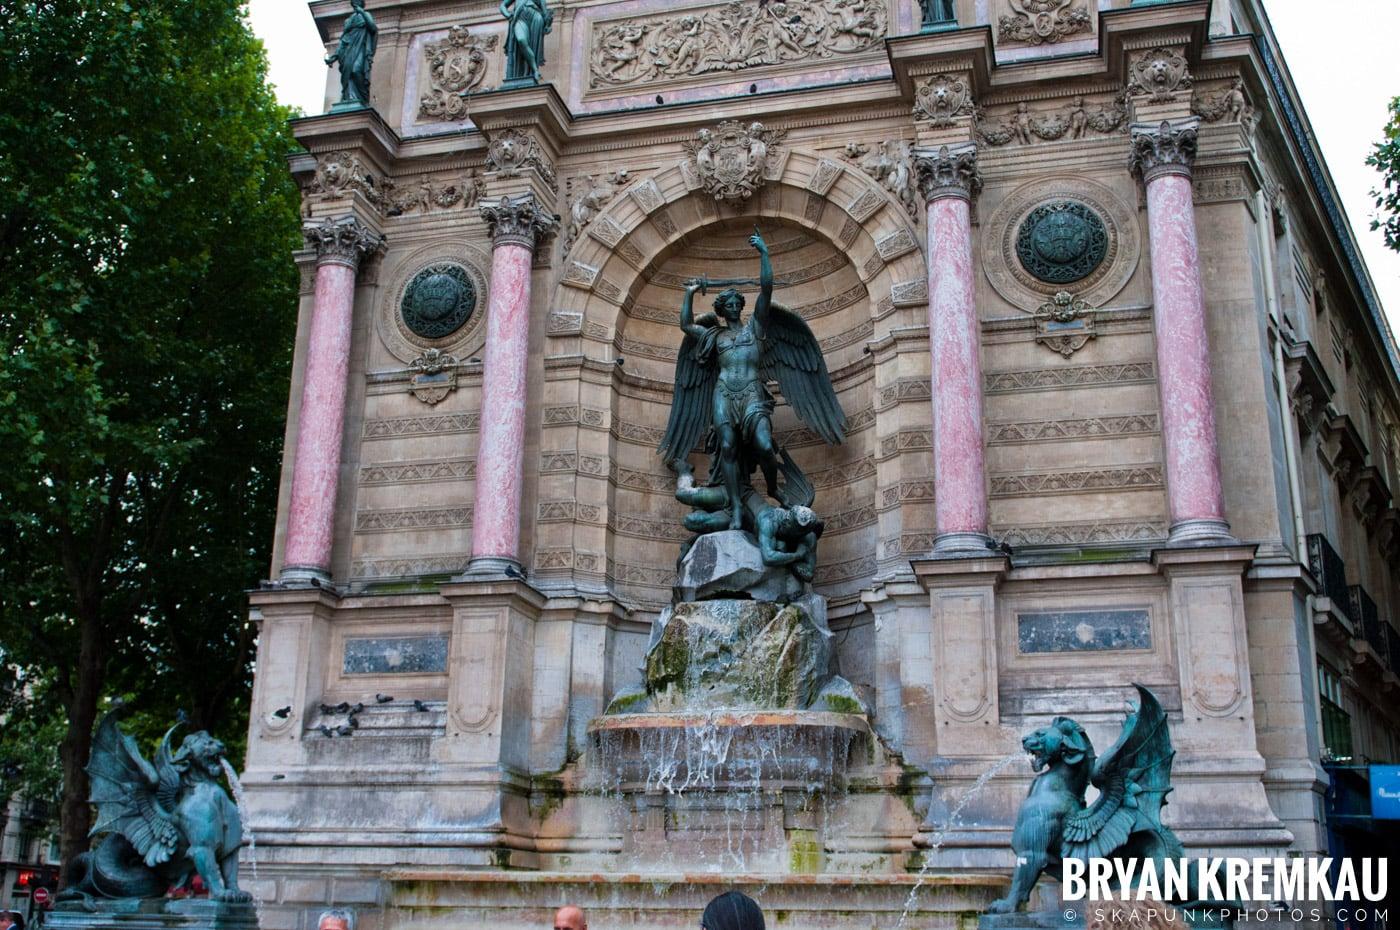 Paris, France Honeymoon - Day 1 - 7.18.11 (6)